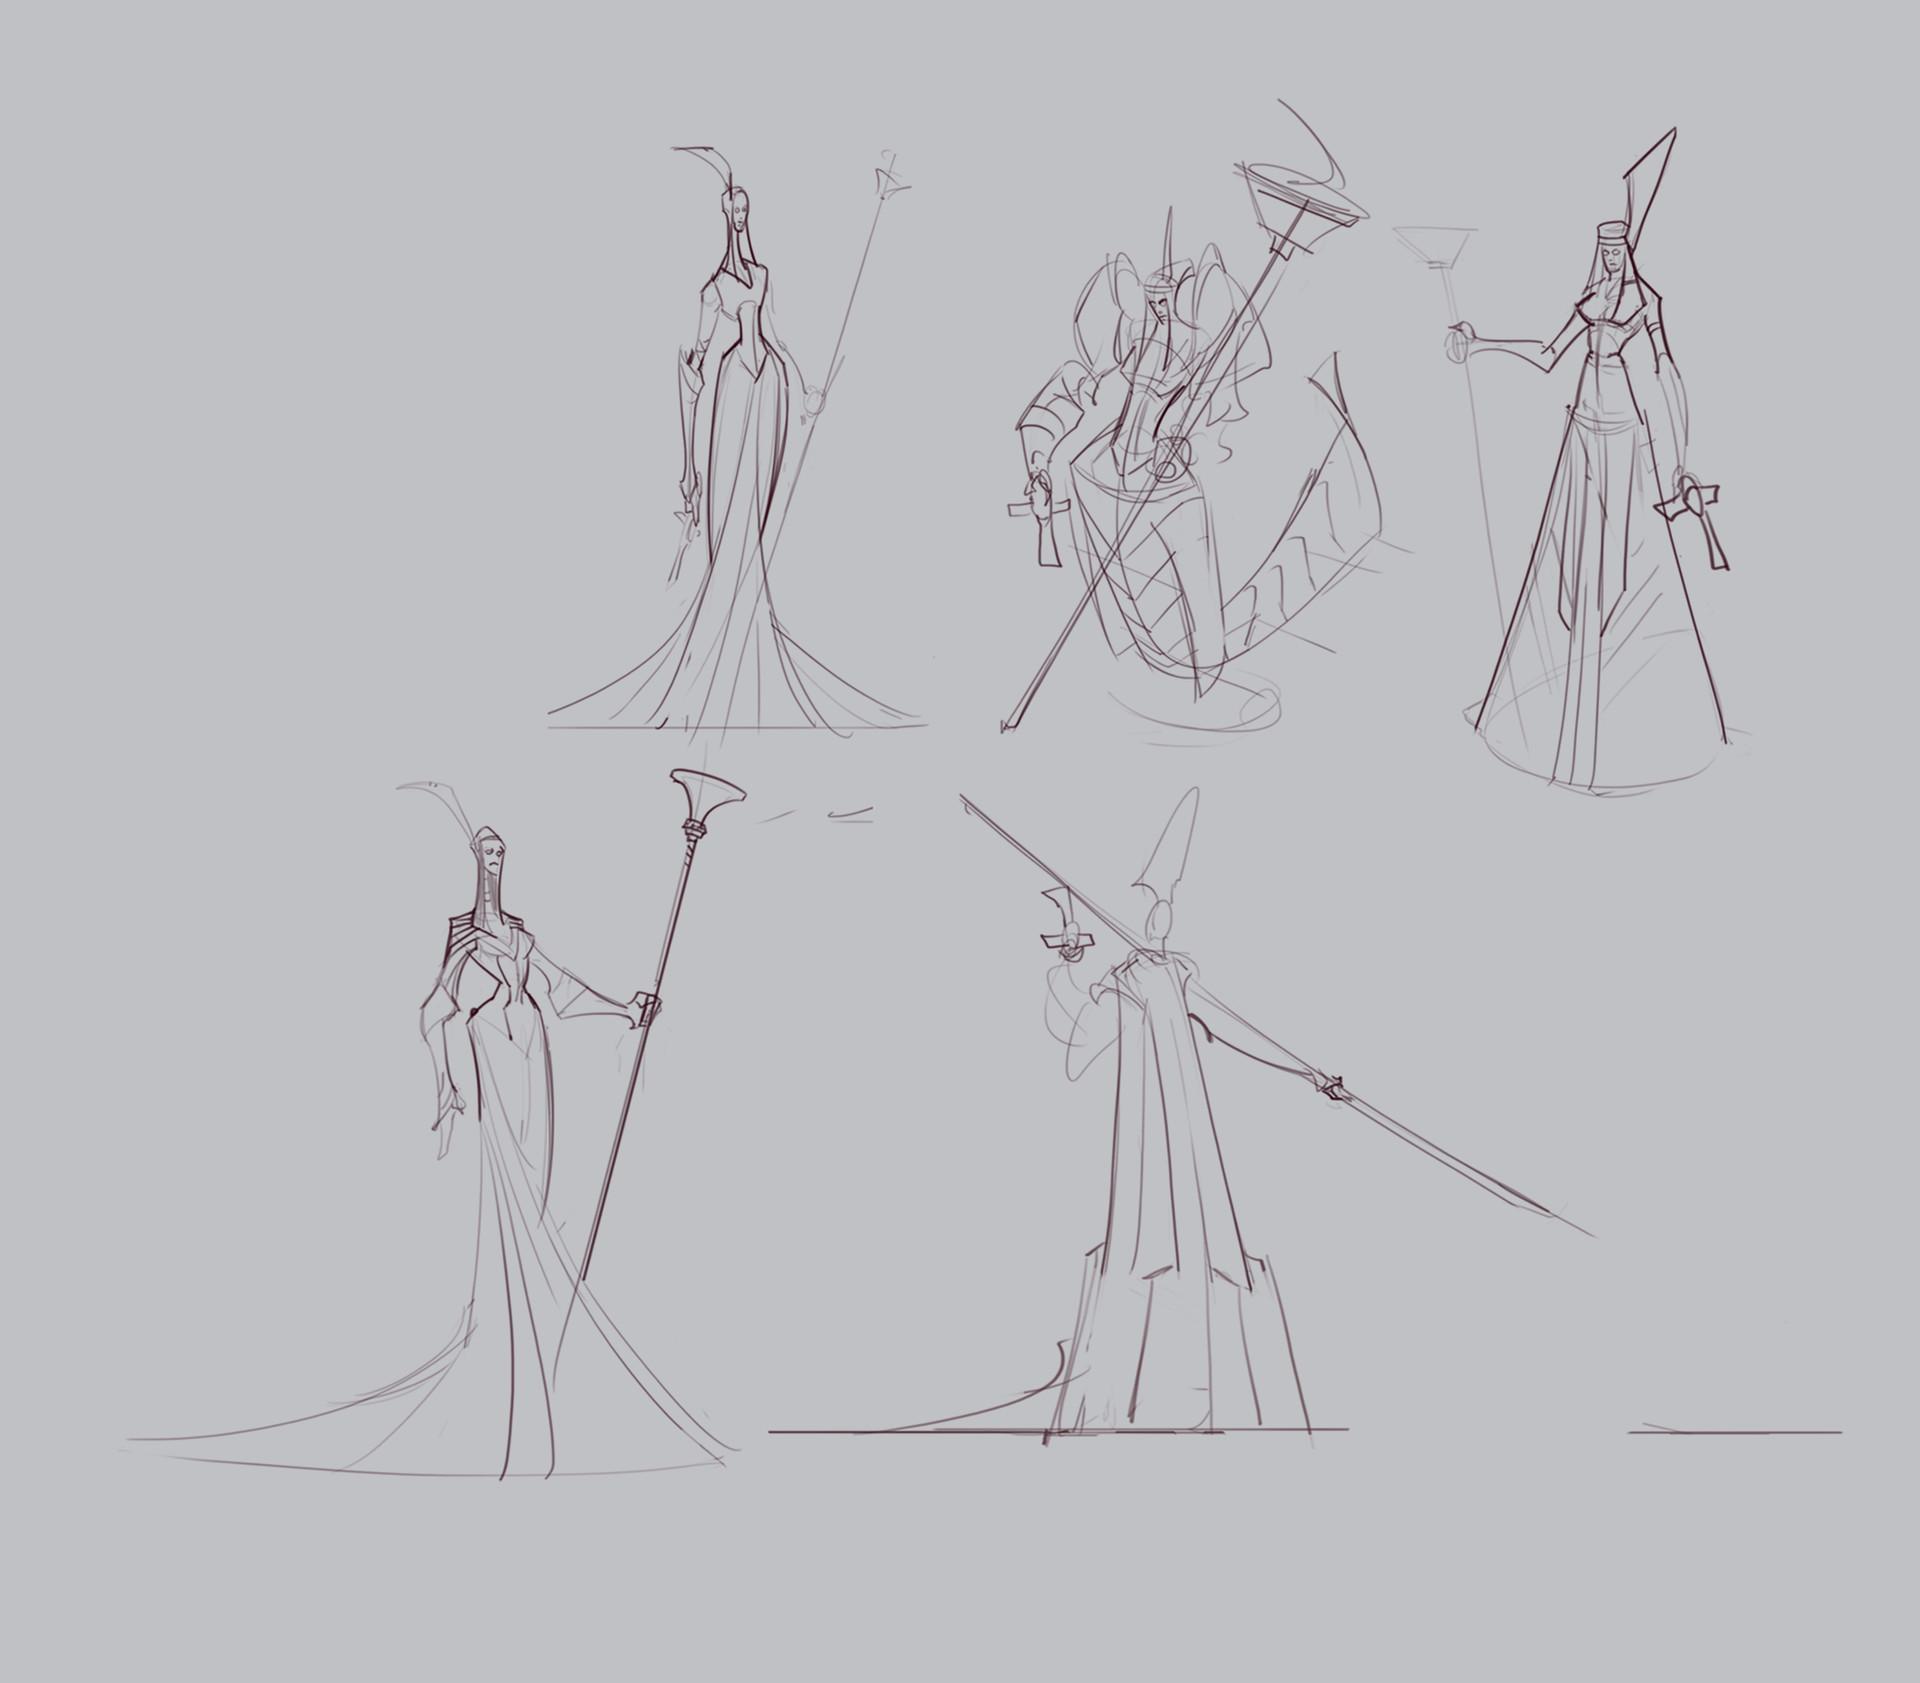 Drakhas oguzalp donduren sketches